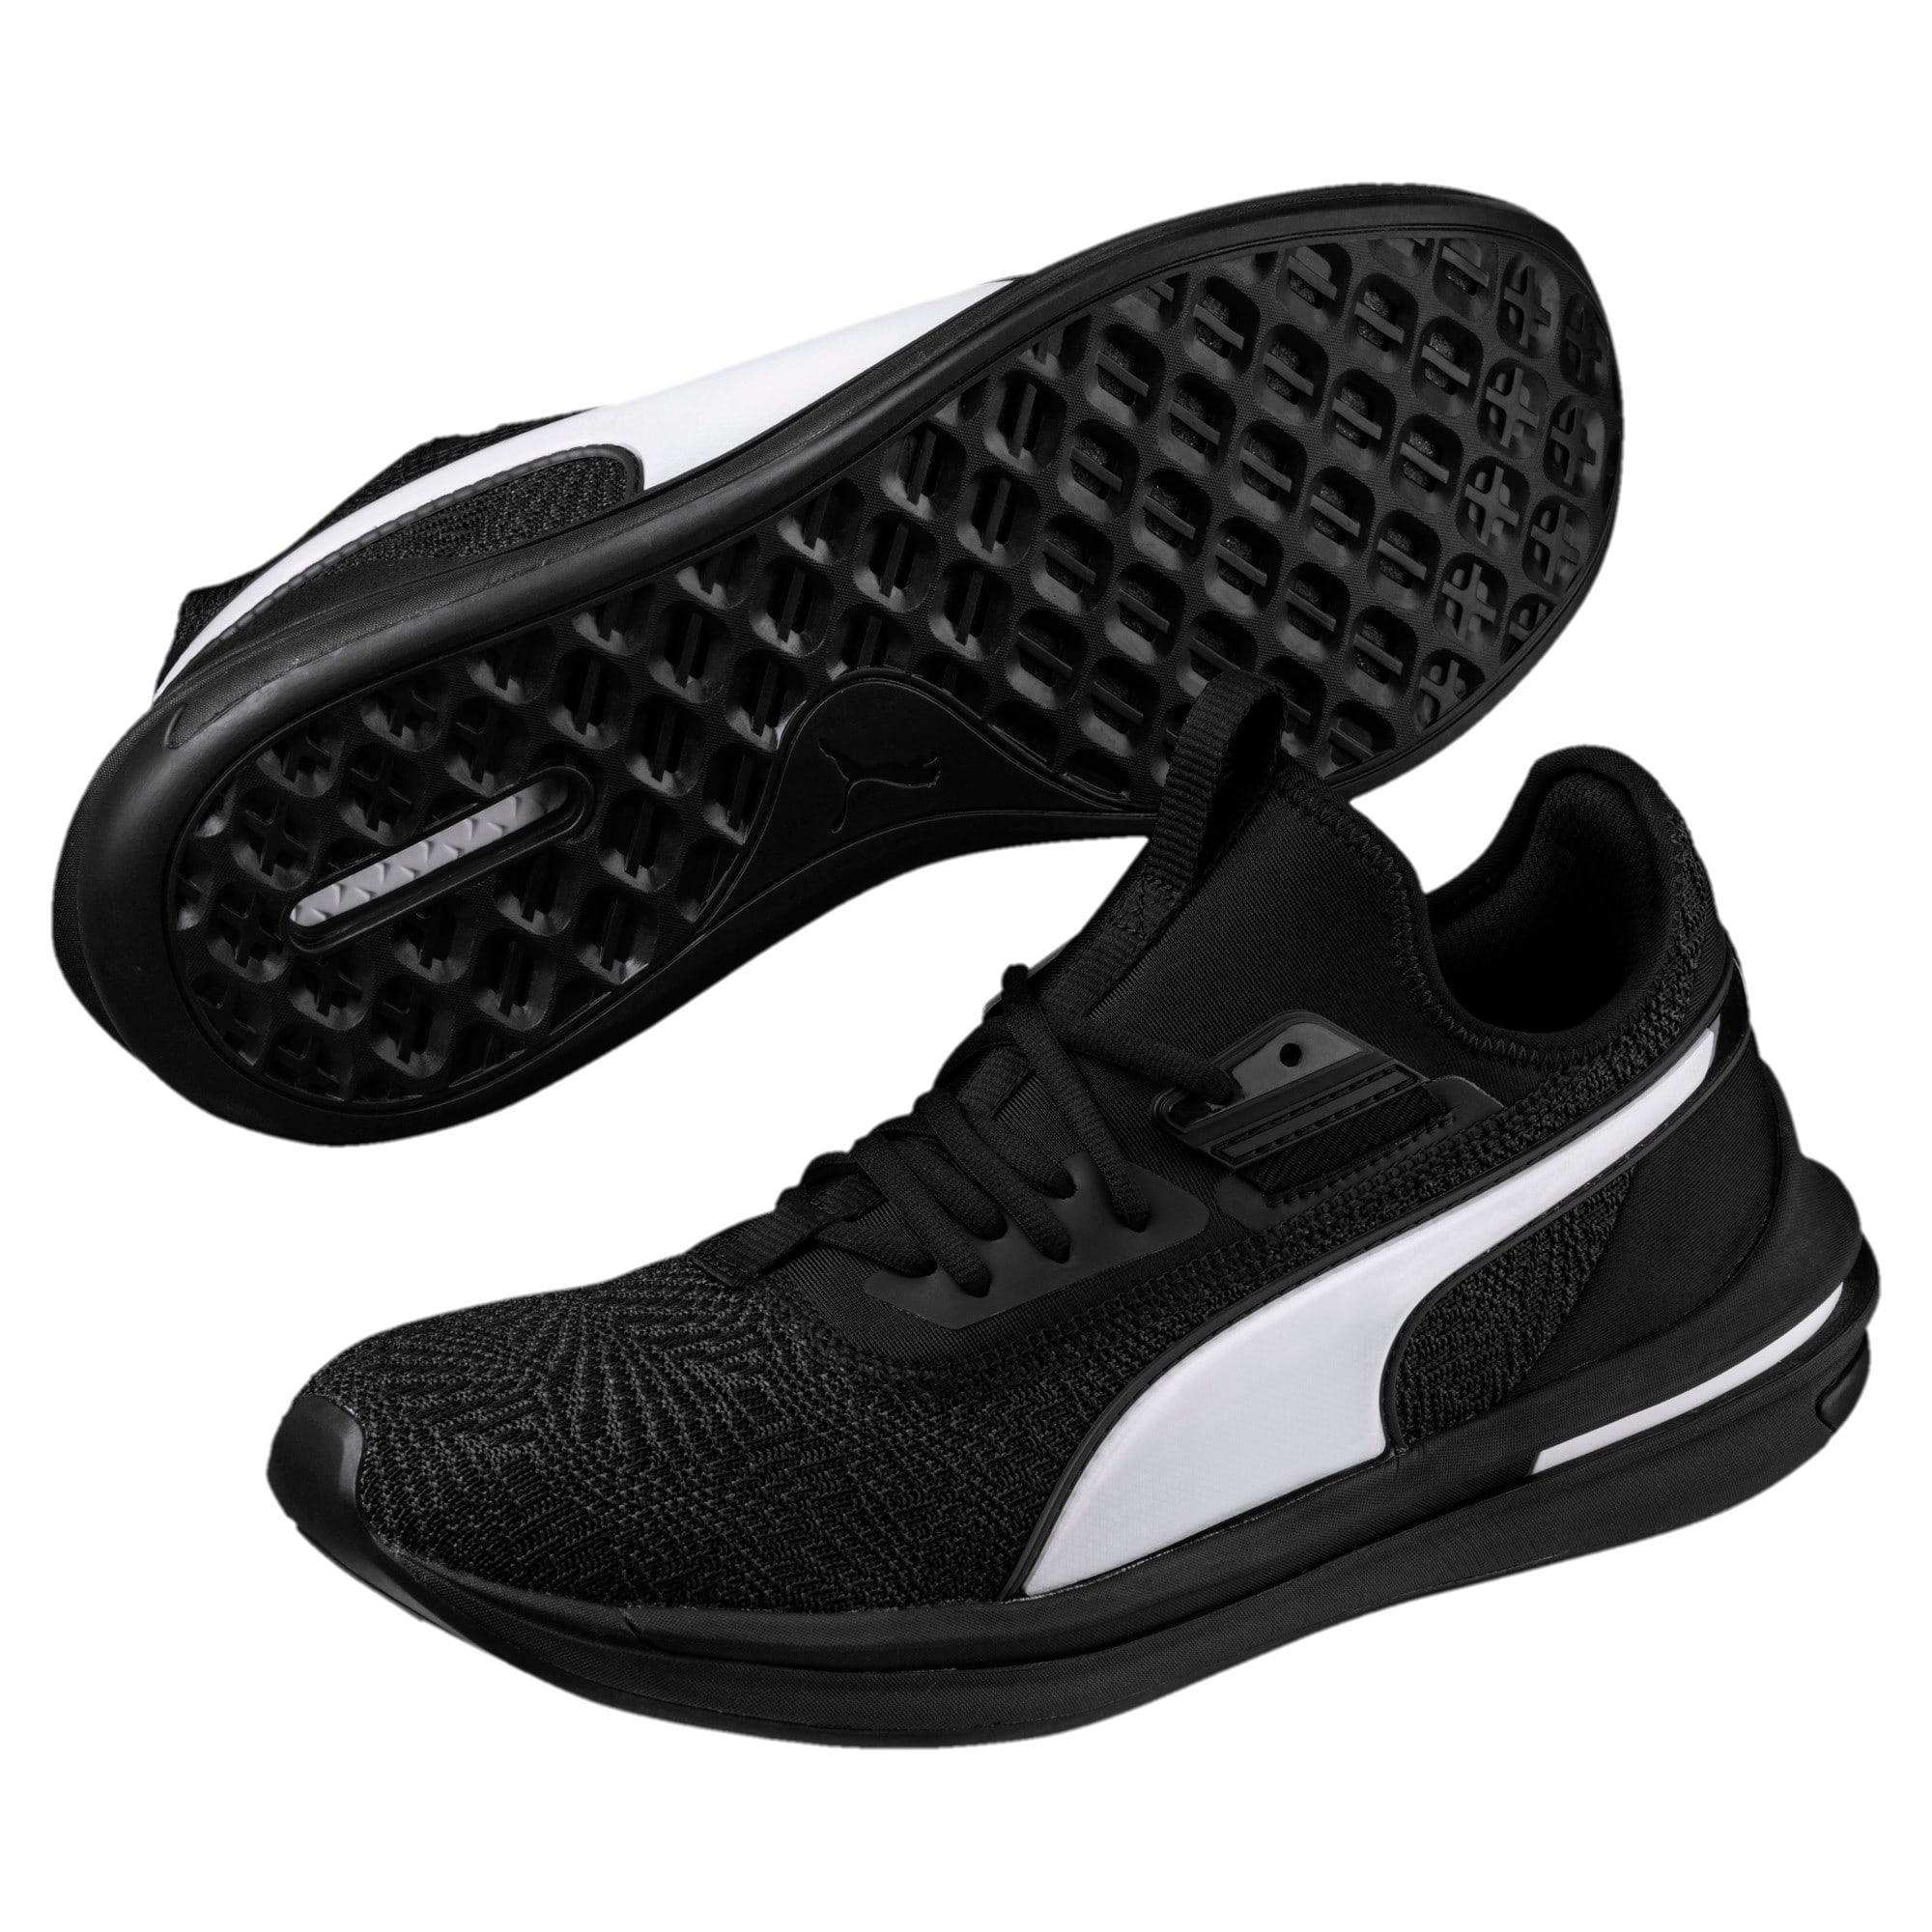 Thumbnail 2 of IGNITE Limitless SR-71 Running Shoes, Puma Black, medium